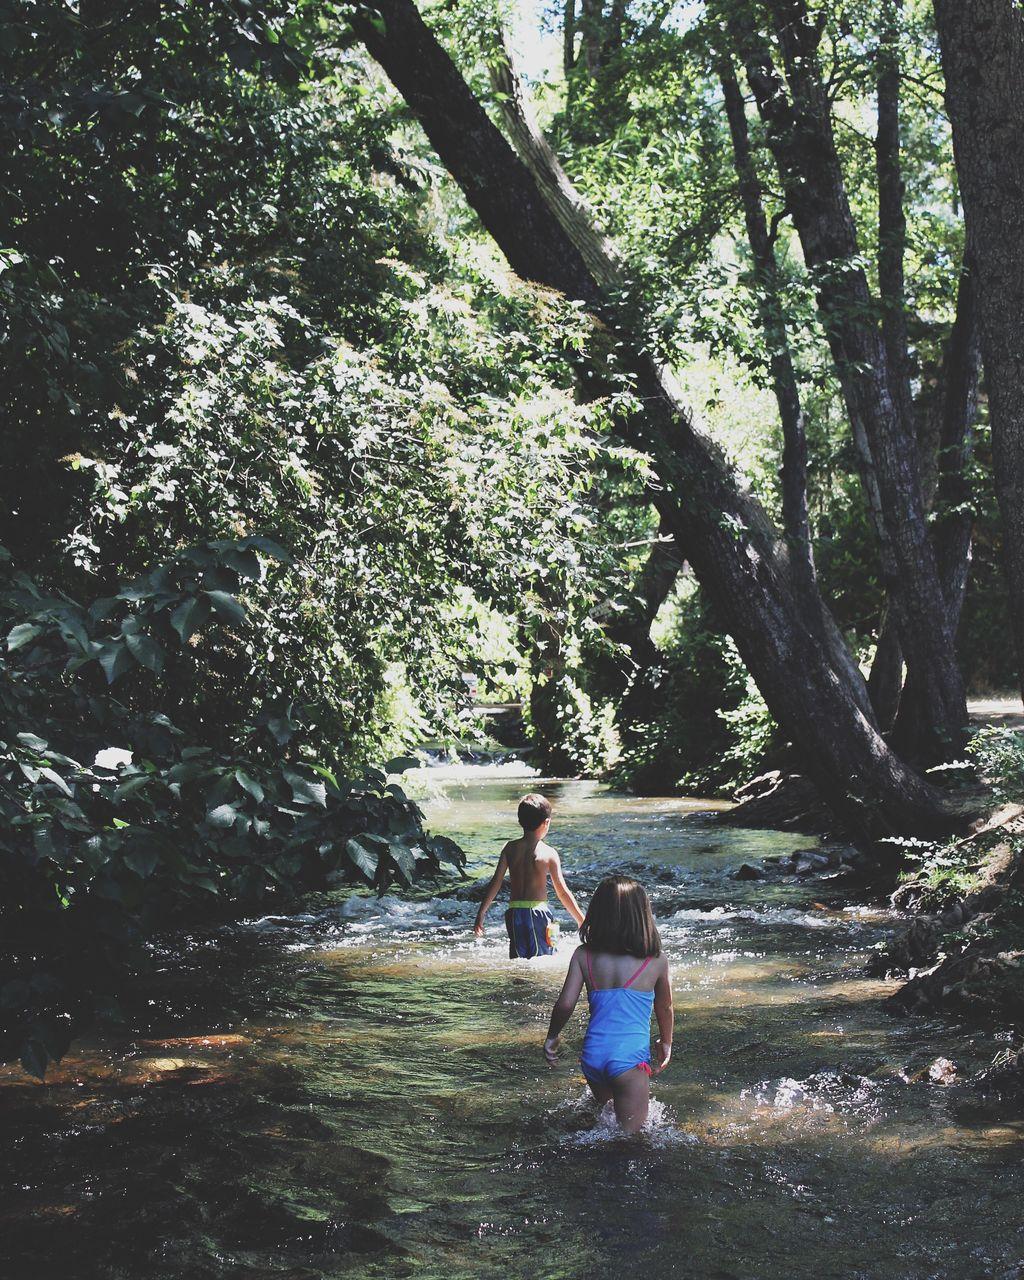 Rear view of kids walking on stream in forest